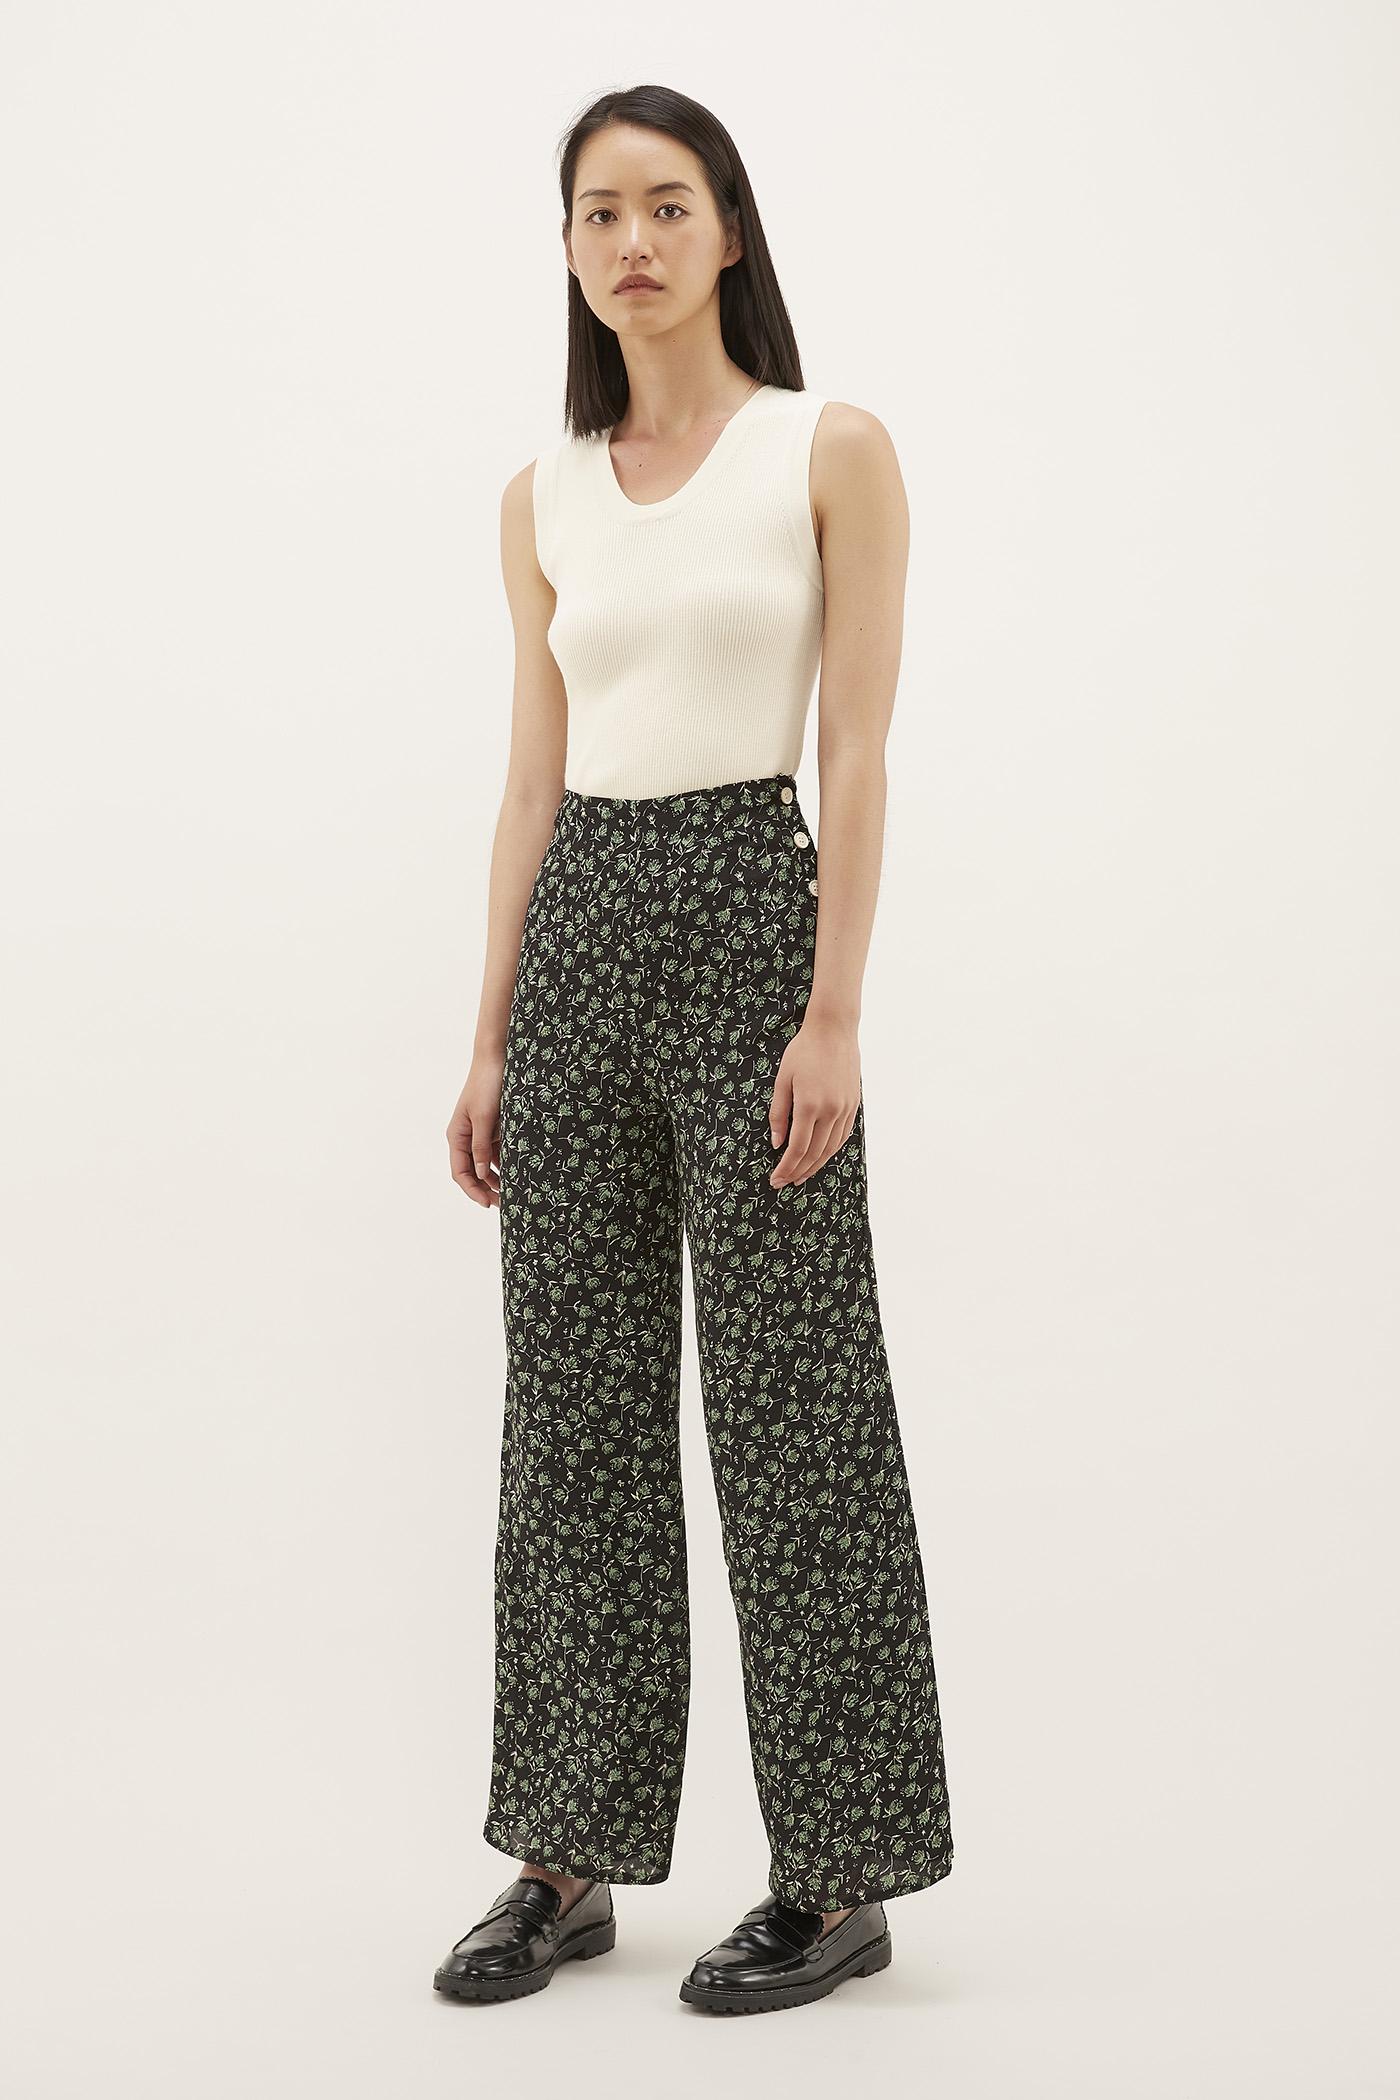 Olara Side-Button Pants